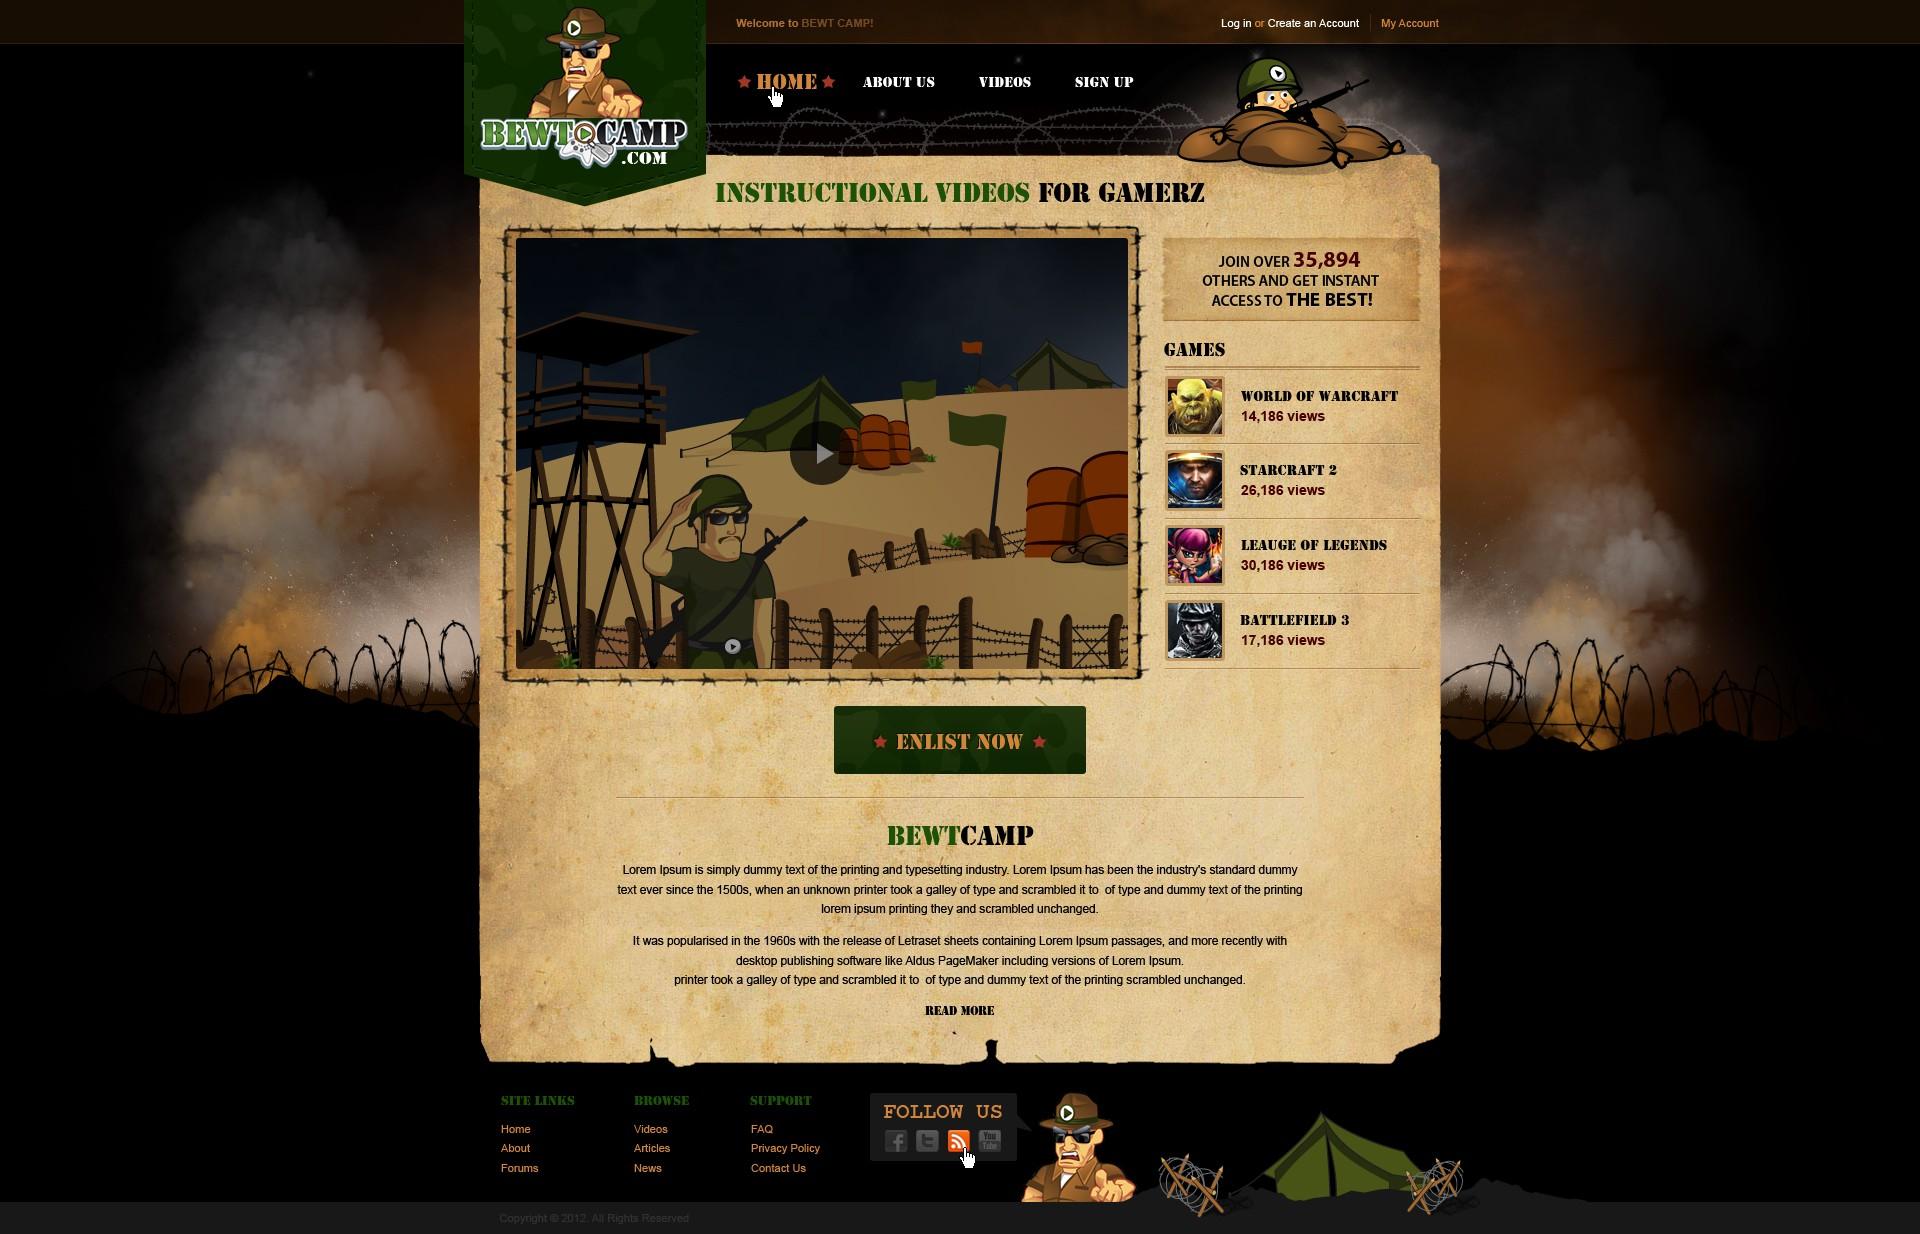 website design for Bewtcamp